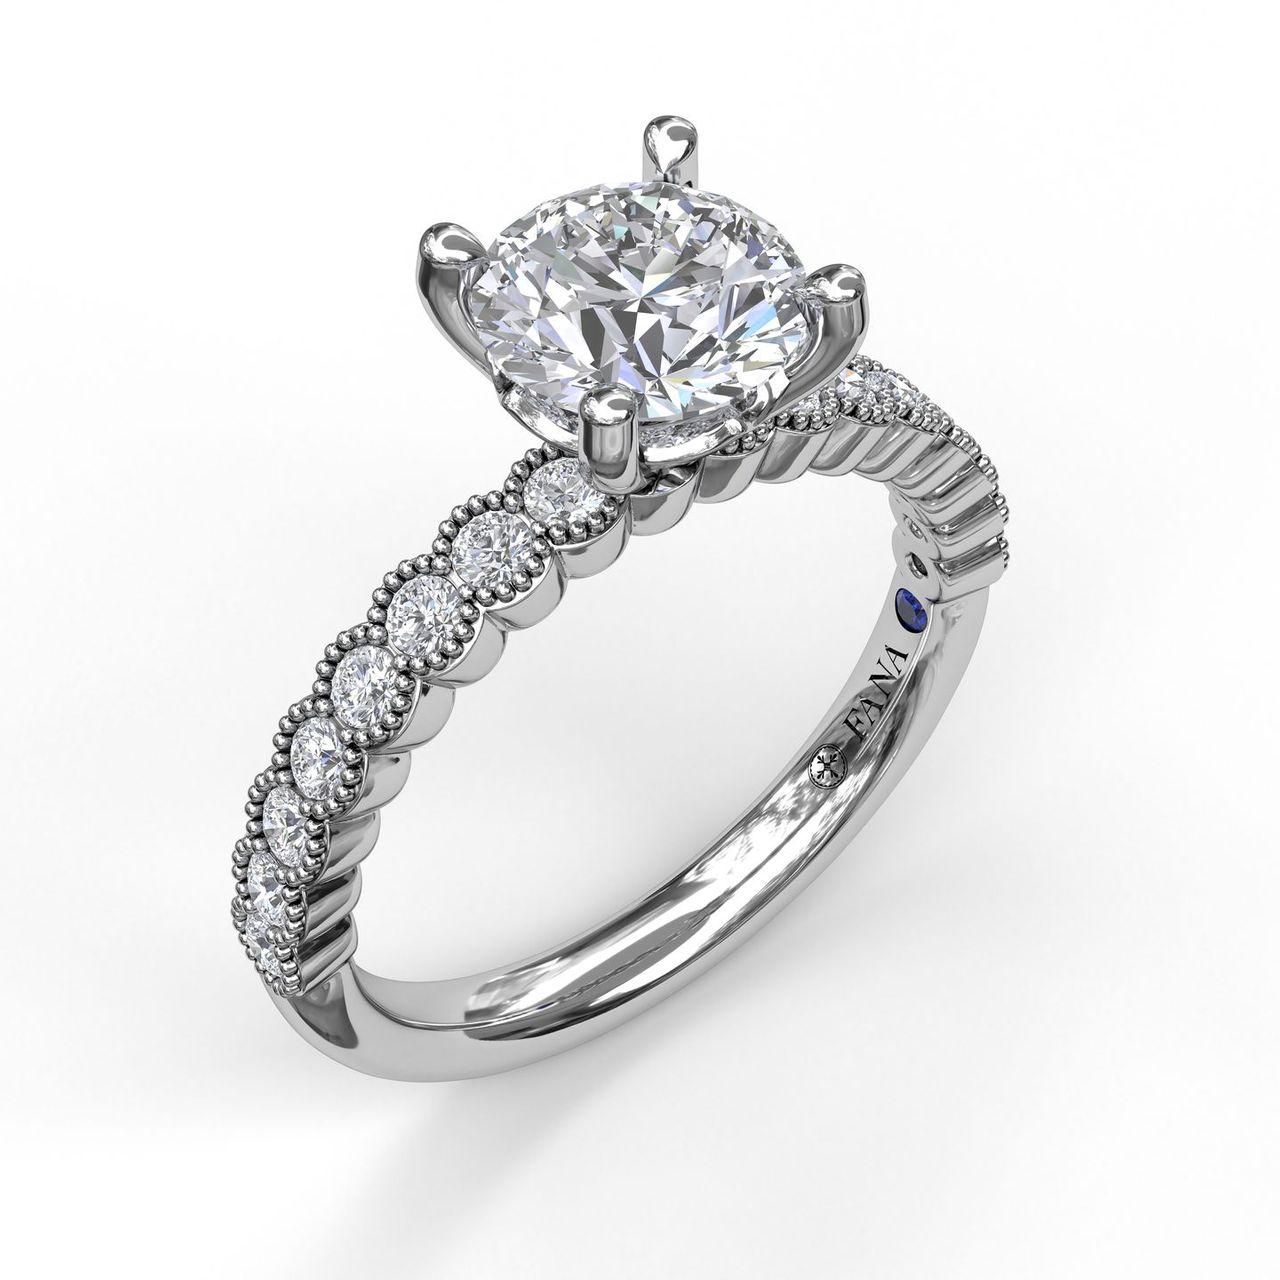 Diamond Engagement Ring with a Delicate Milgrain Edge